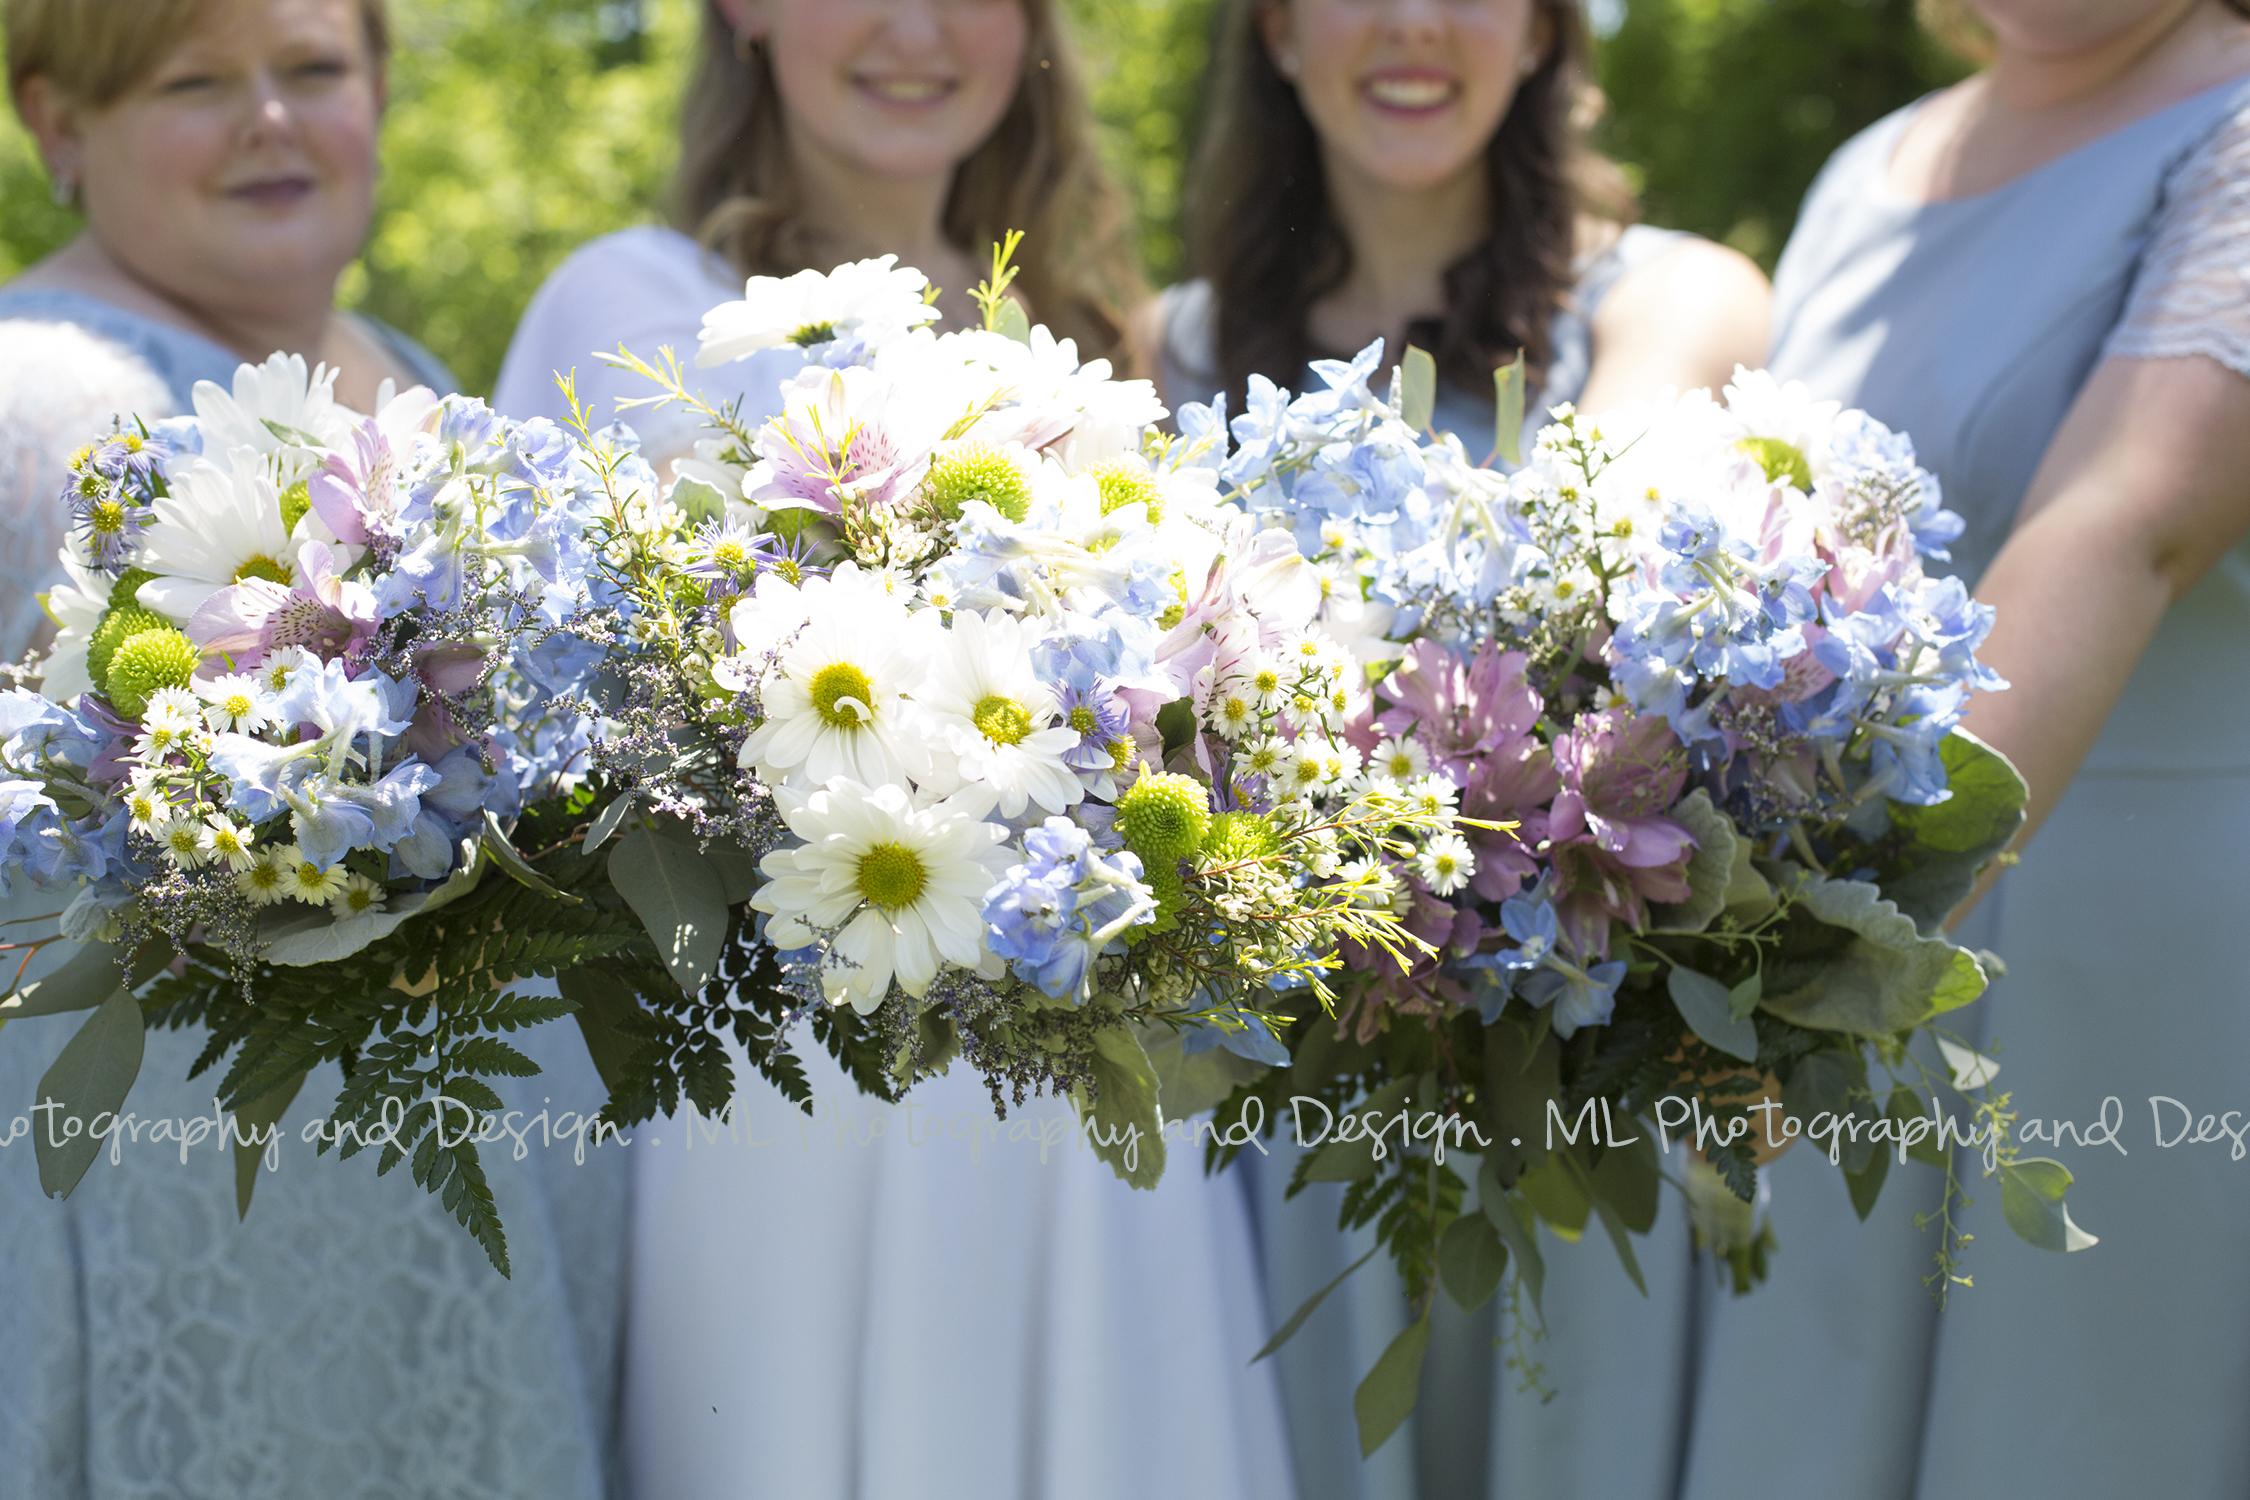 Lac-Lawrann-Conservancy-Wedding-21.jpg